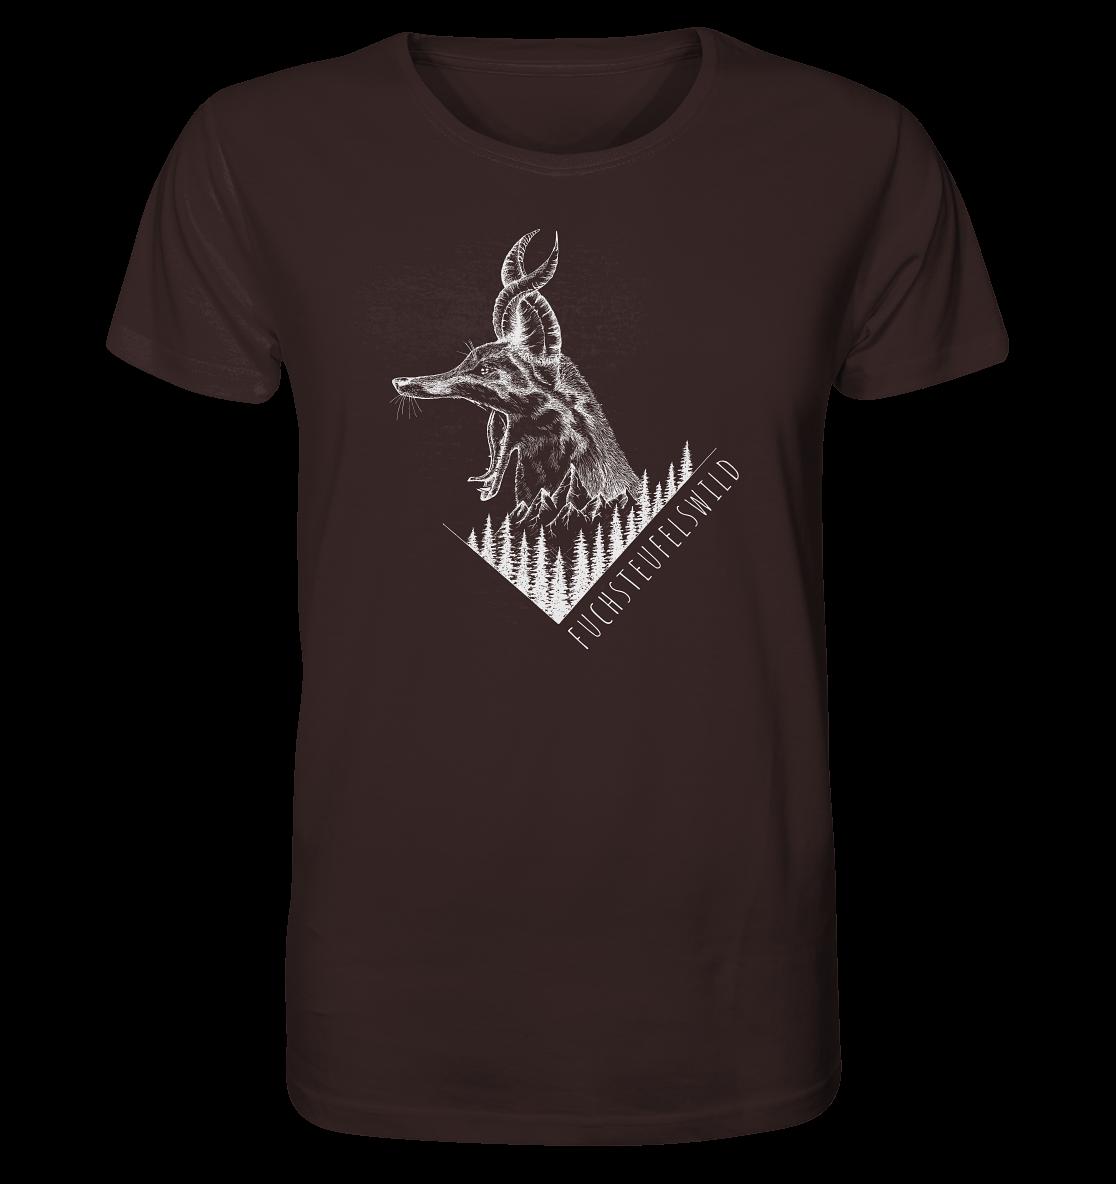 front-organic-shirt-372726-1116x-3.png